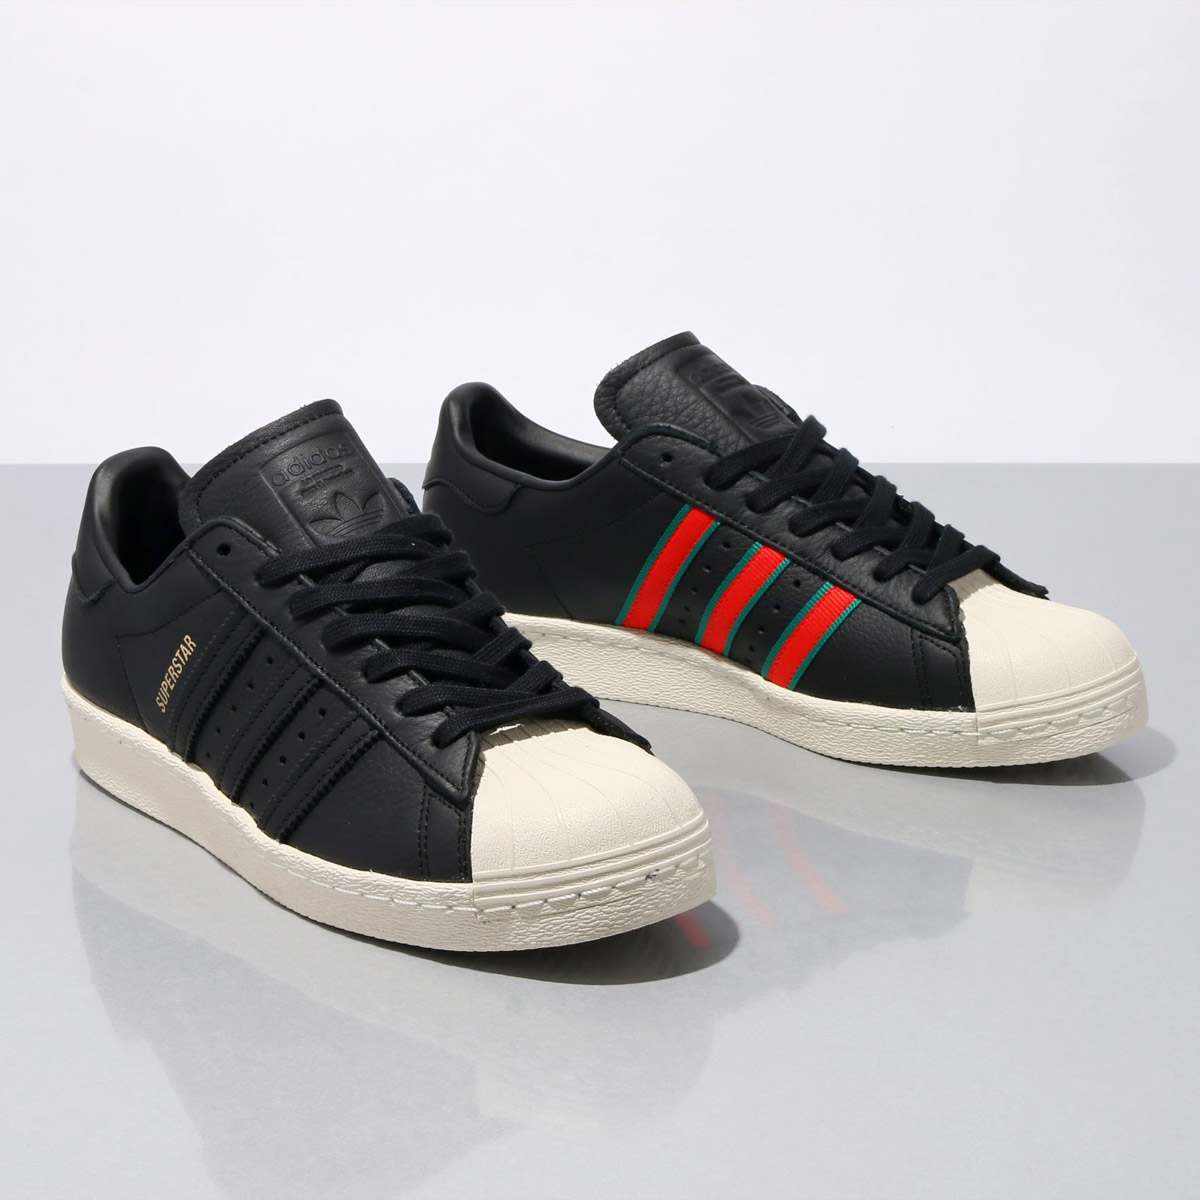 adidas Superstar 80s Core BlackGreenRed CQ2656